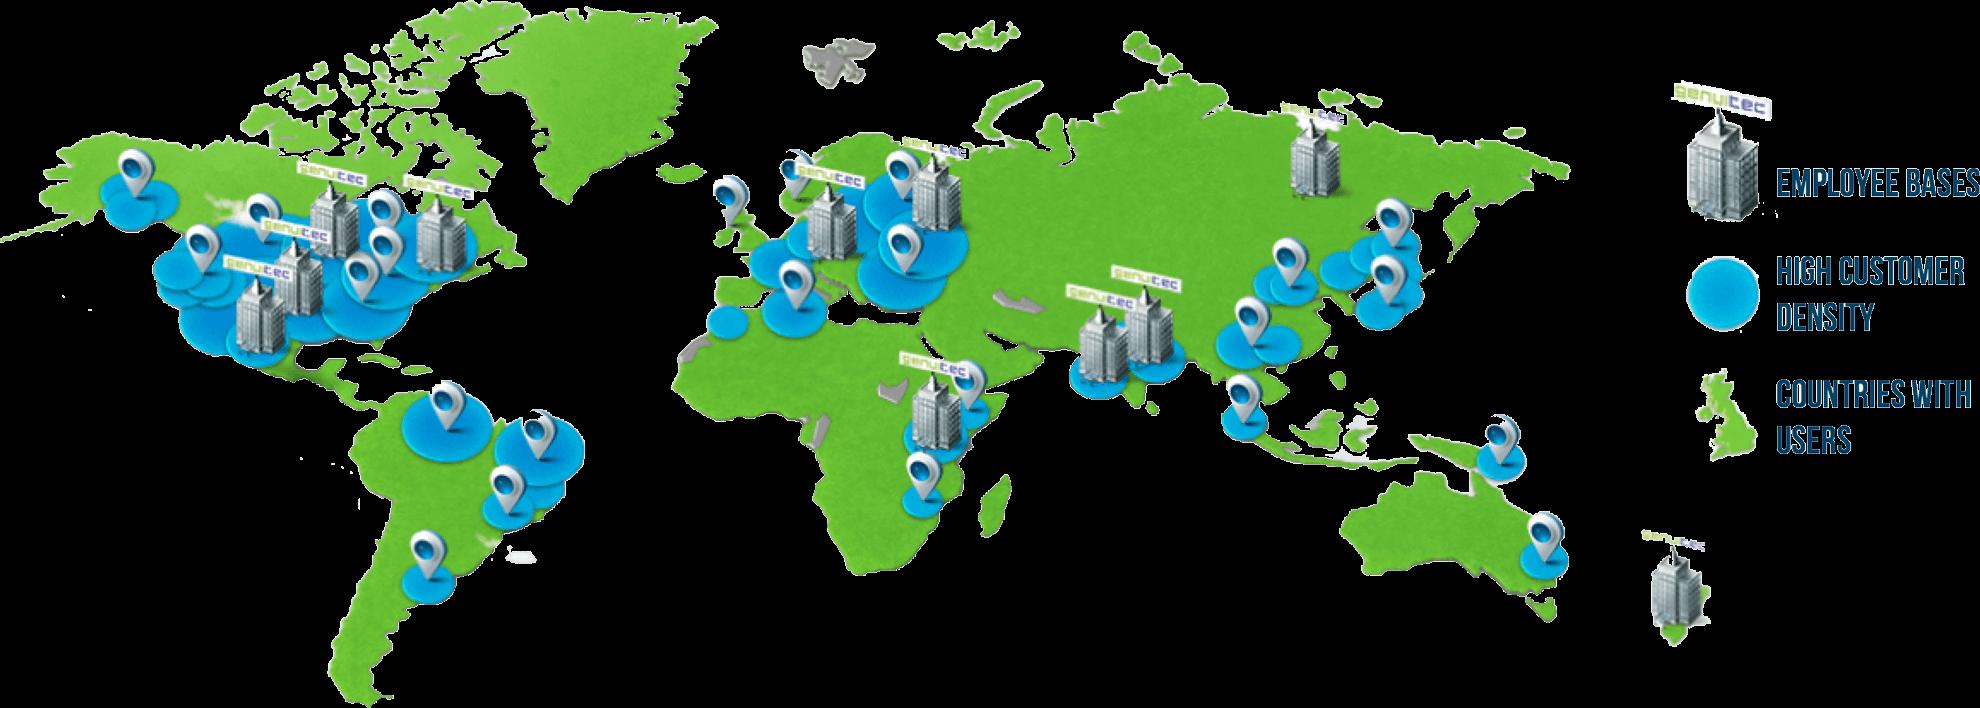 Working virtually at Genuitec creates a global team